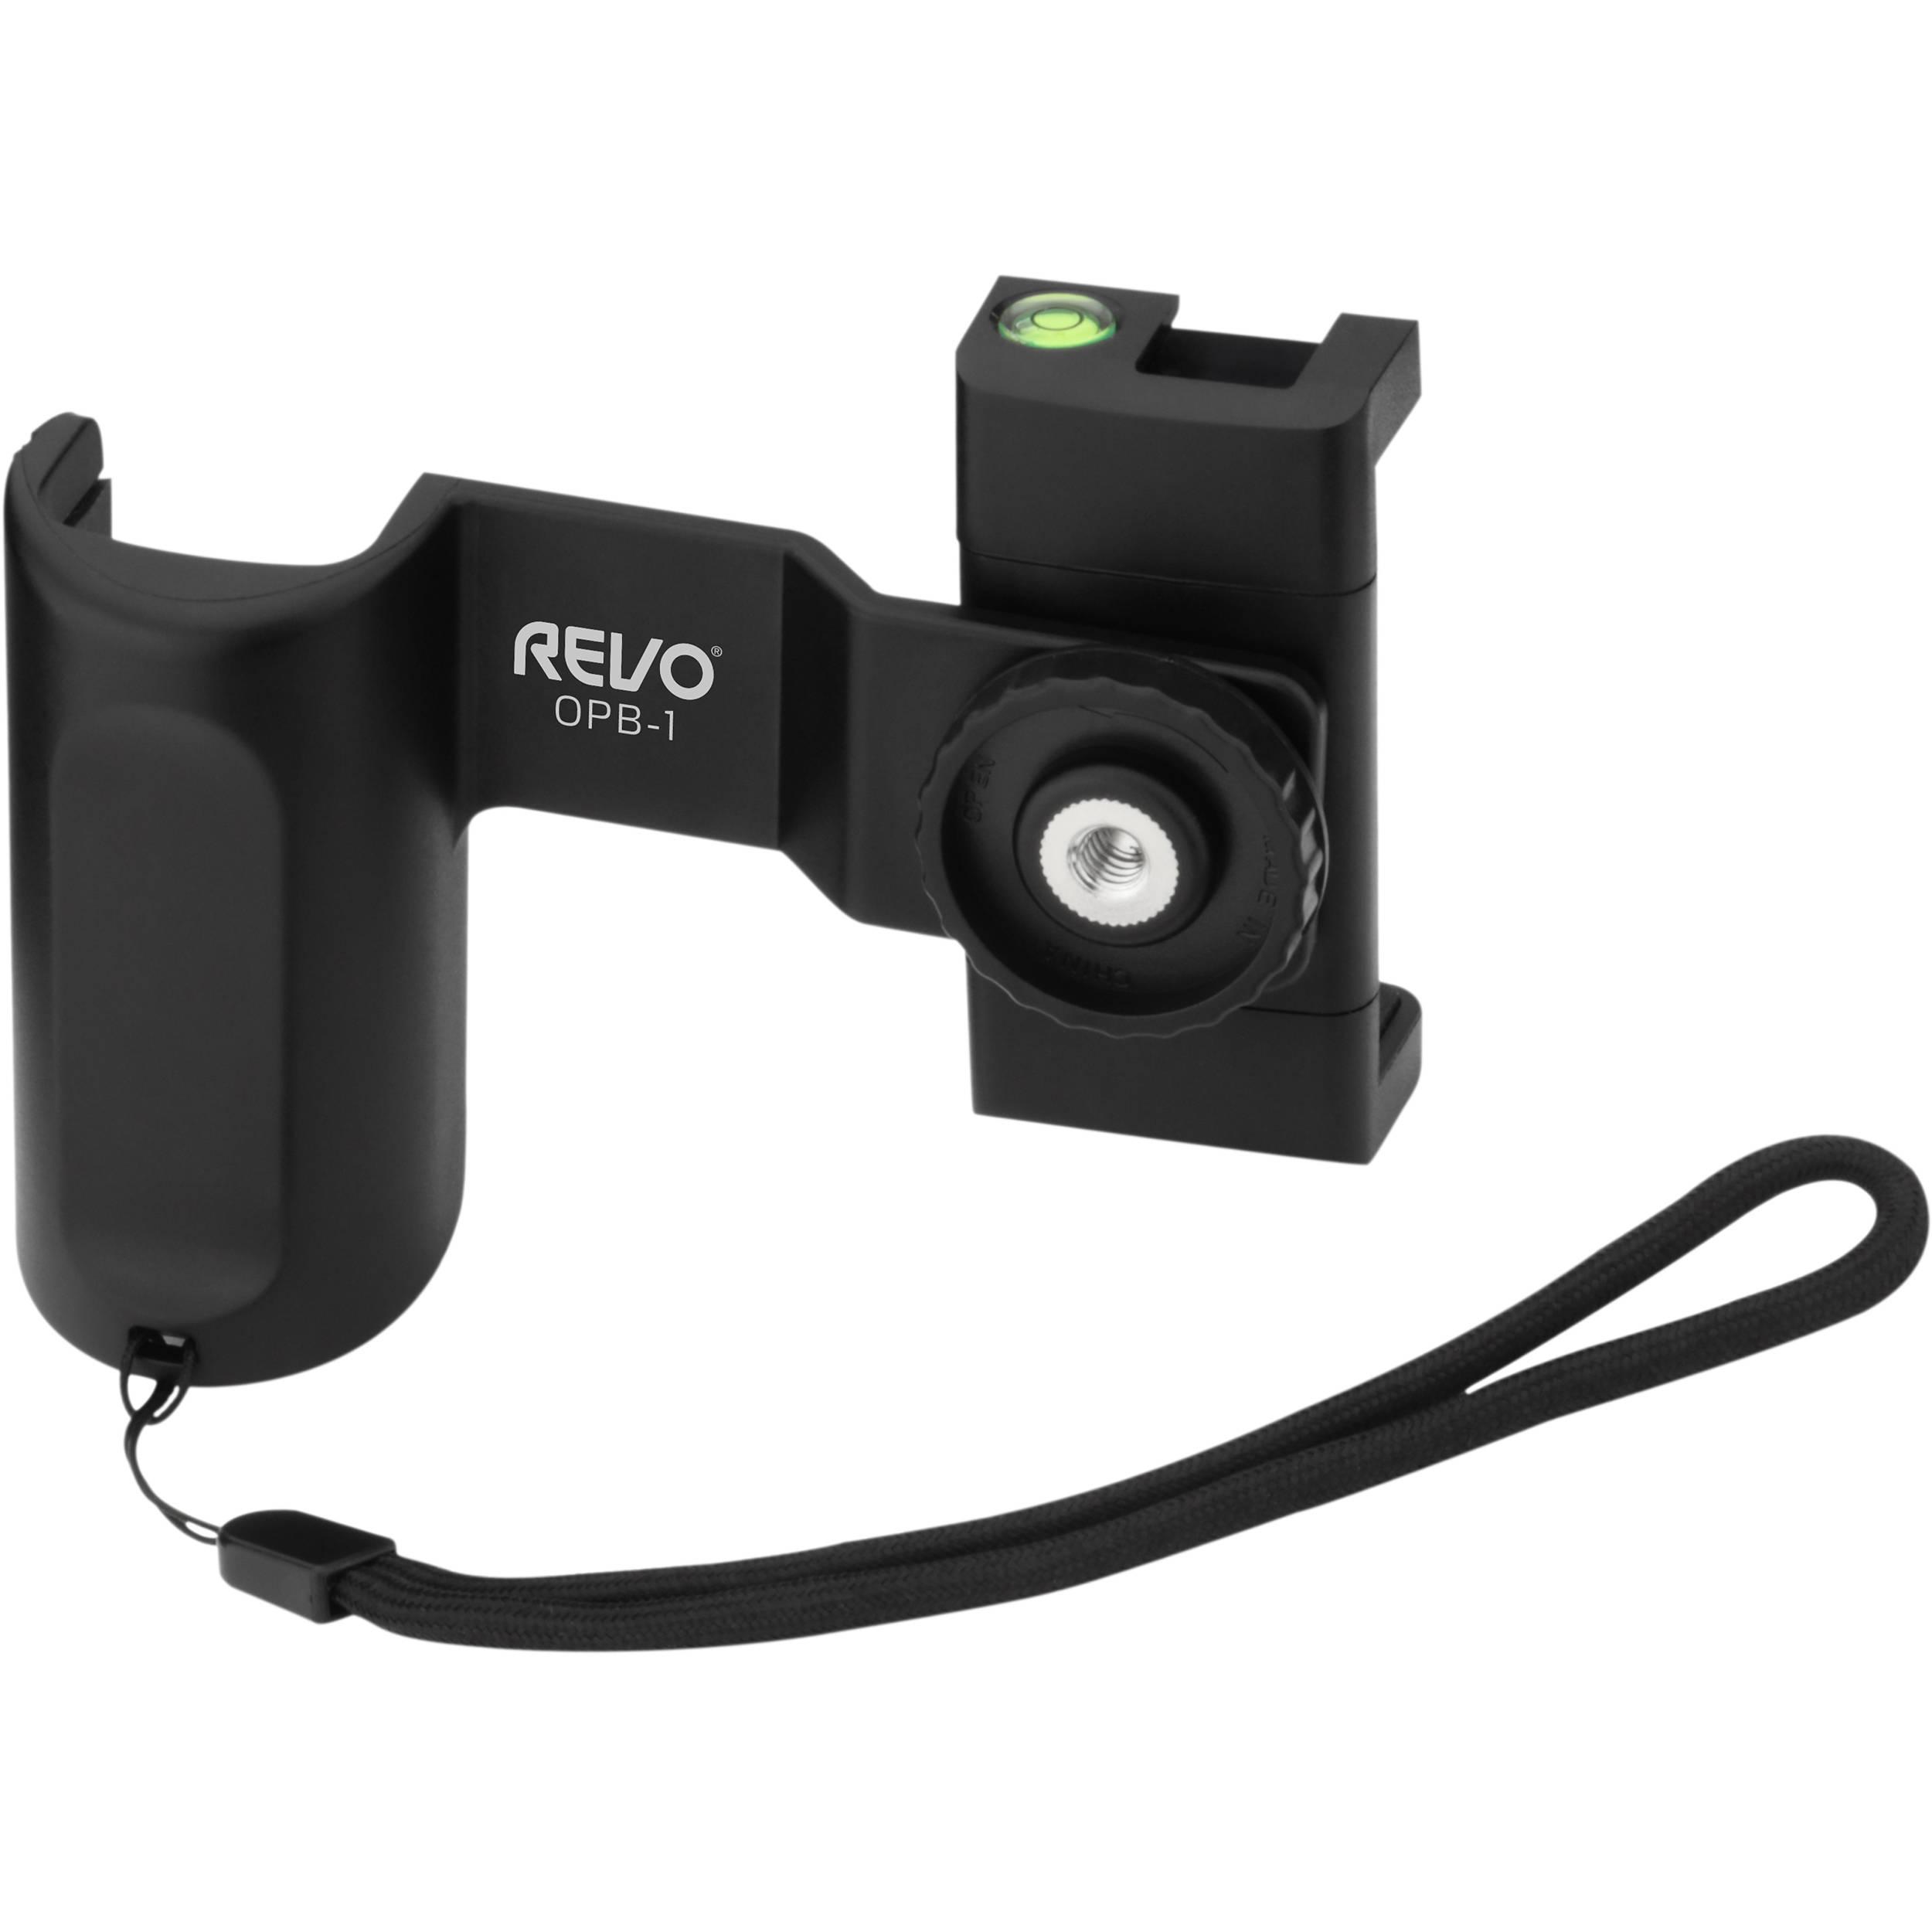 revo smartphone bracket for dji osmo pocket pocket 2 gimbals